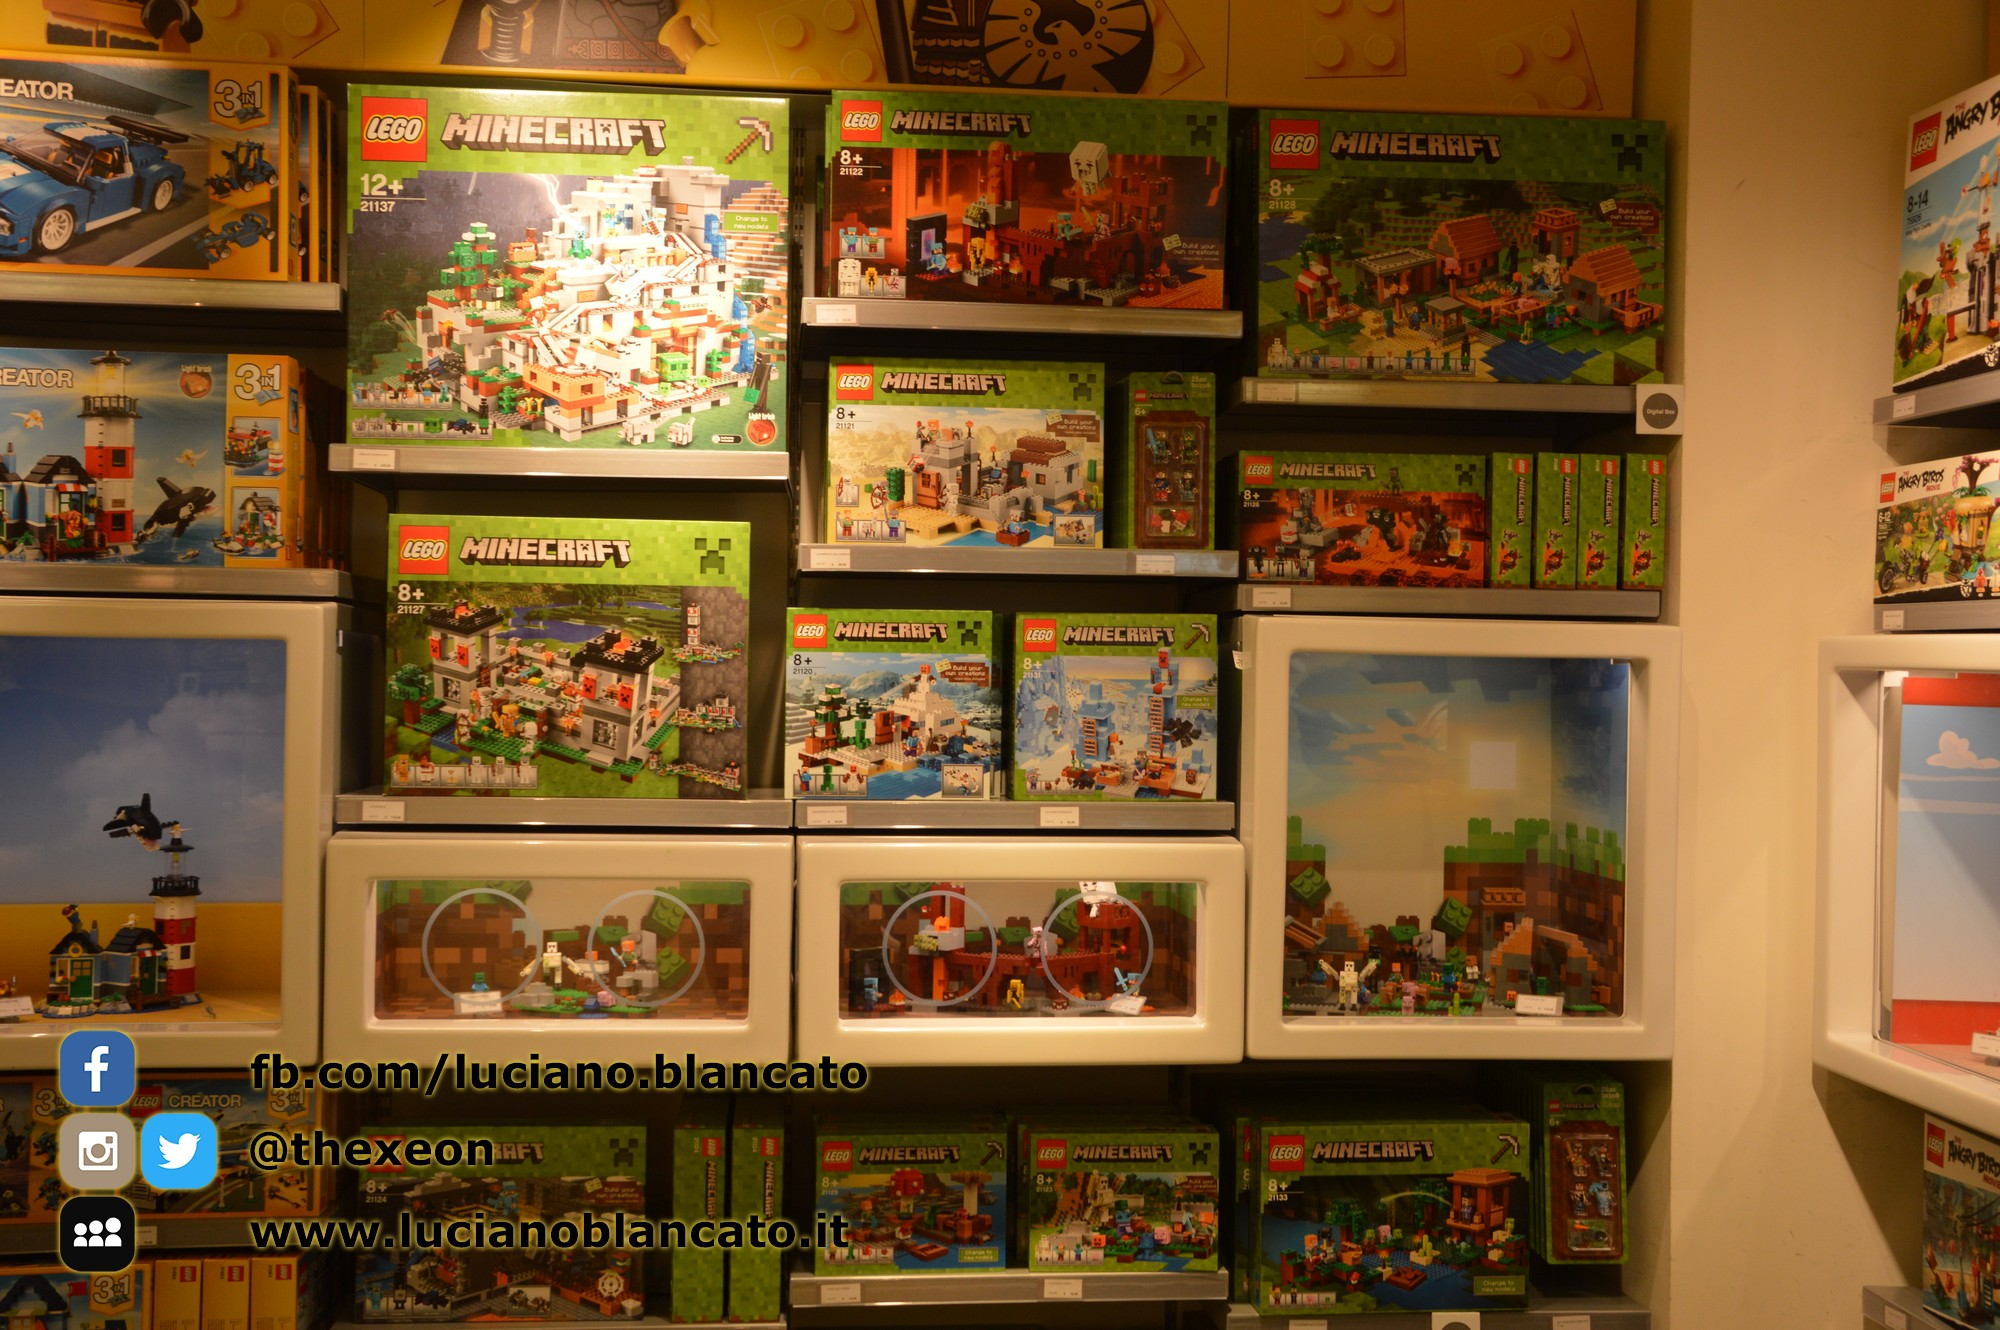 Milano - Lego Store - Serie MINECRAFT